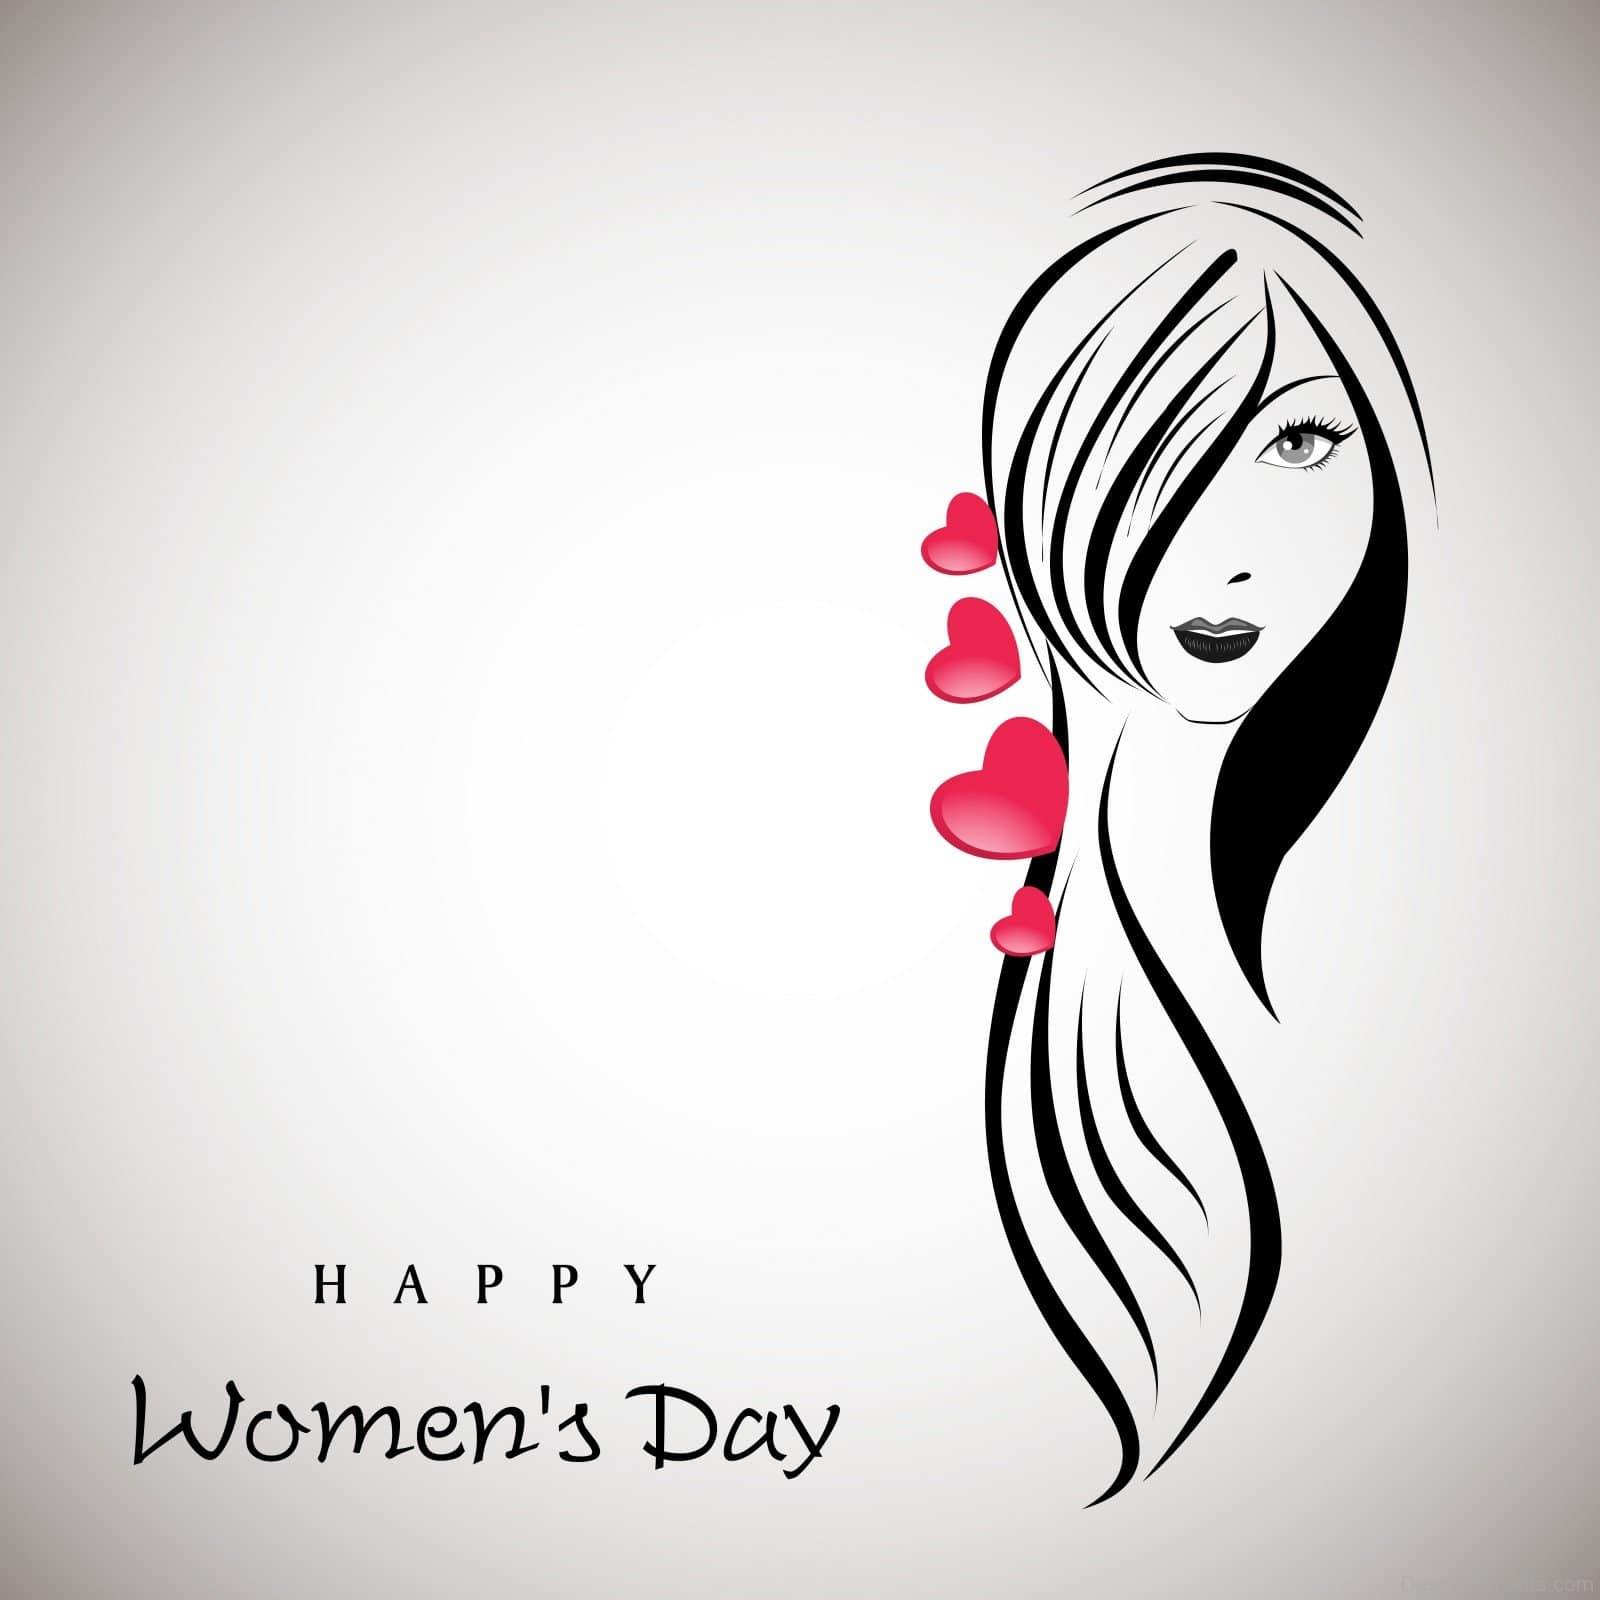 Happy Women's Day Wallpaper